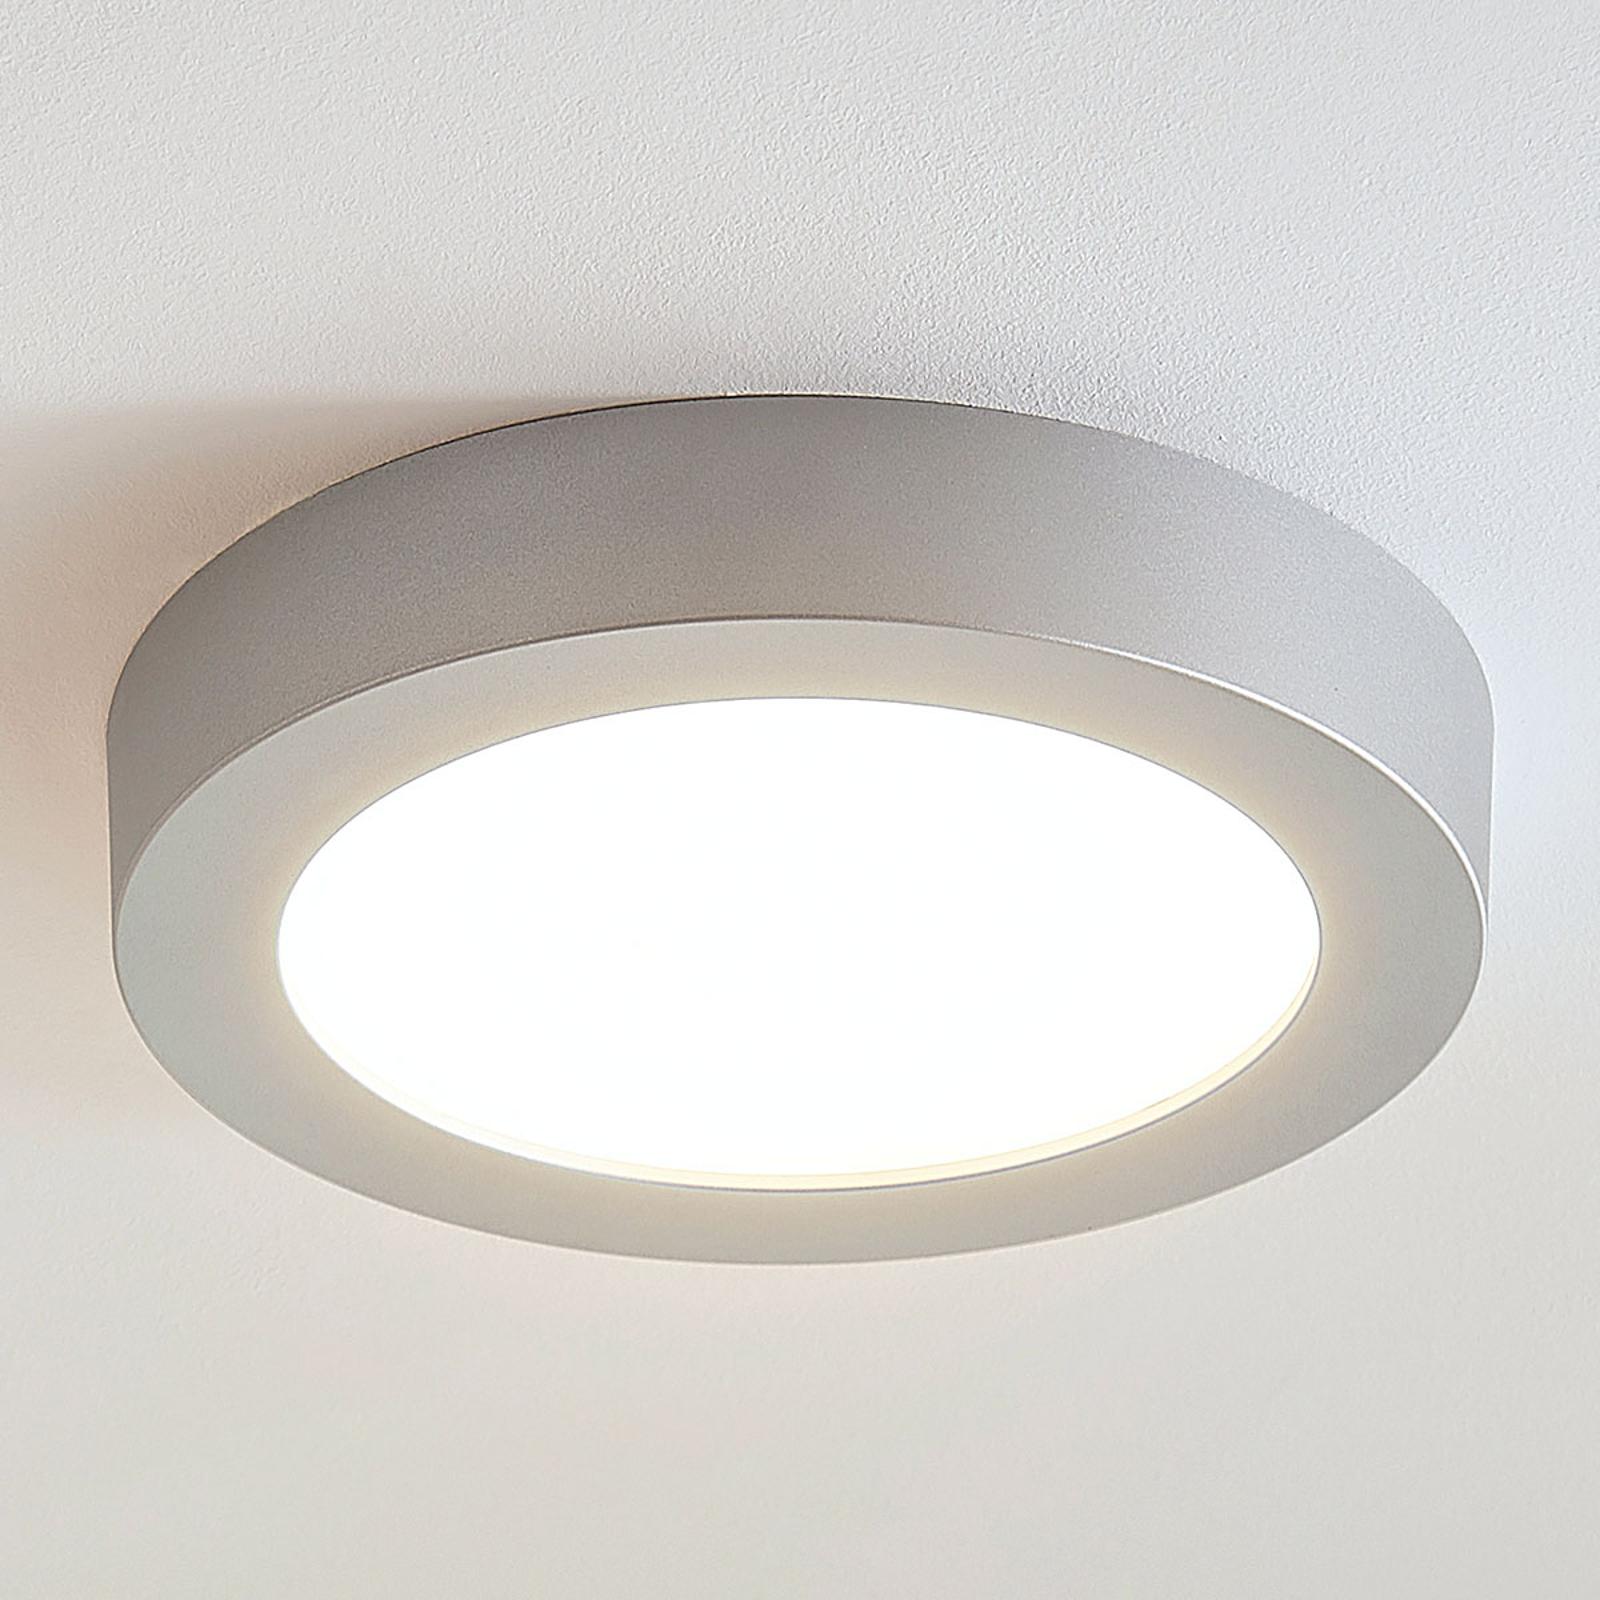 LED plafondlamp Marlo zilver 3000K rond 25,2cm